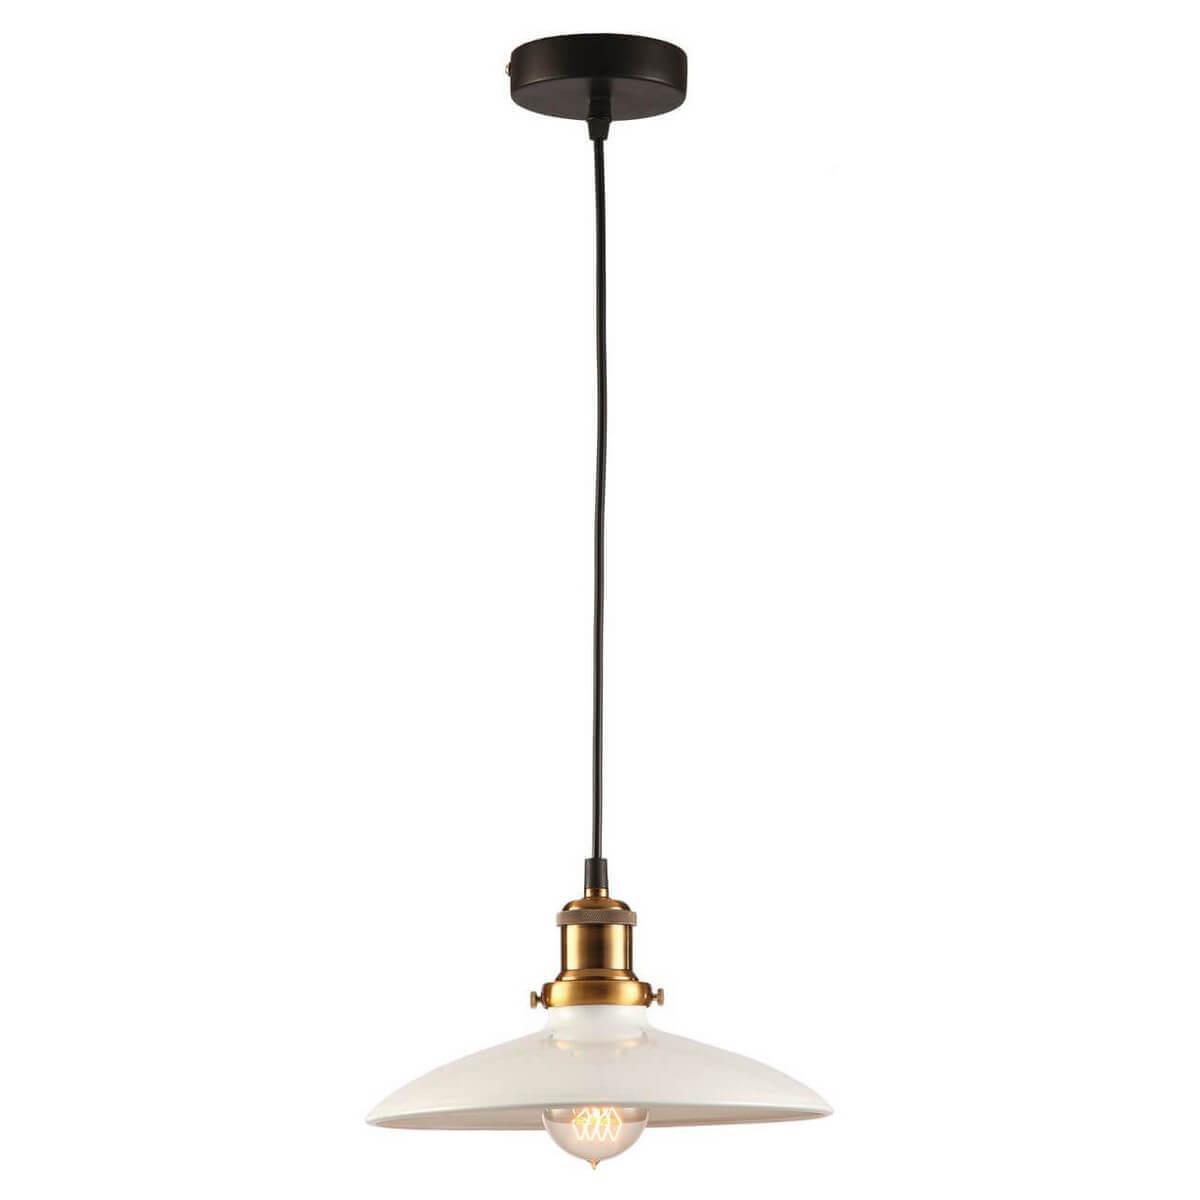 Светильник Lussole LOFT GRLSP-9605 Glen Cove светильник lussole loft grlsp 9605 glen cove